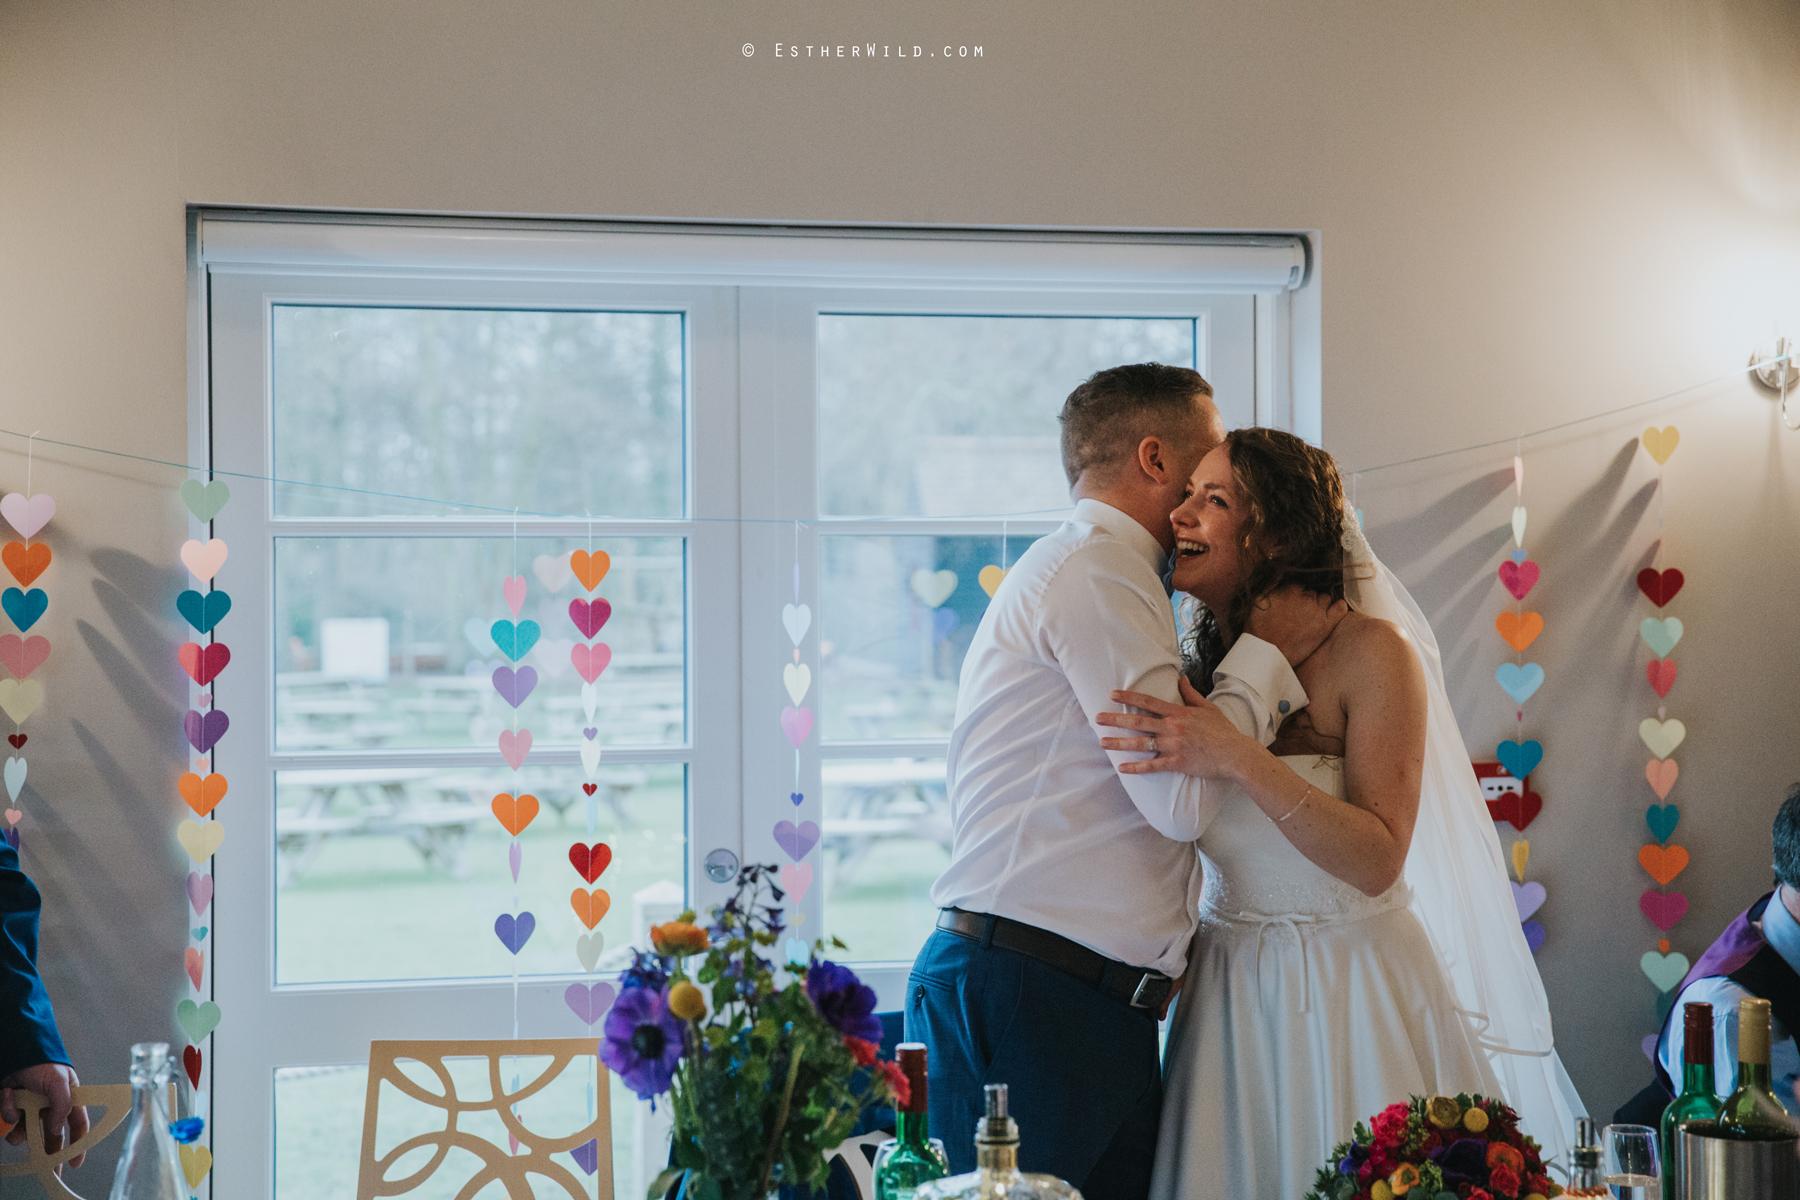 The_BoatHouse_Wedding_Venue_Ormesby_Norfolk_Broads_Boat_Wedding_Photography_Esther_Wild_Photographer_IMG_2545.jpg